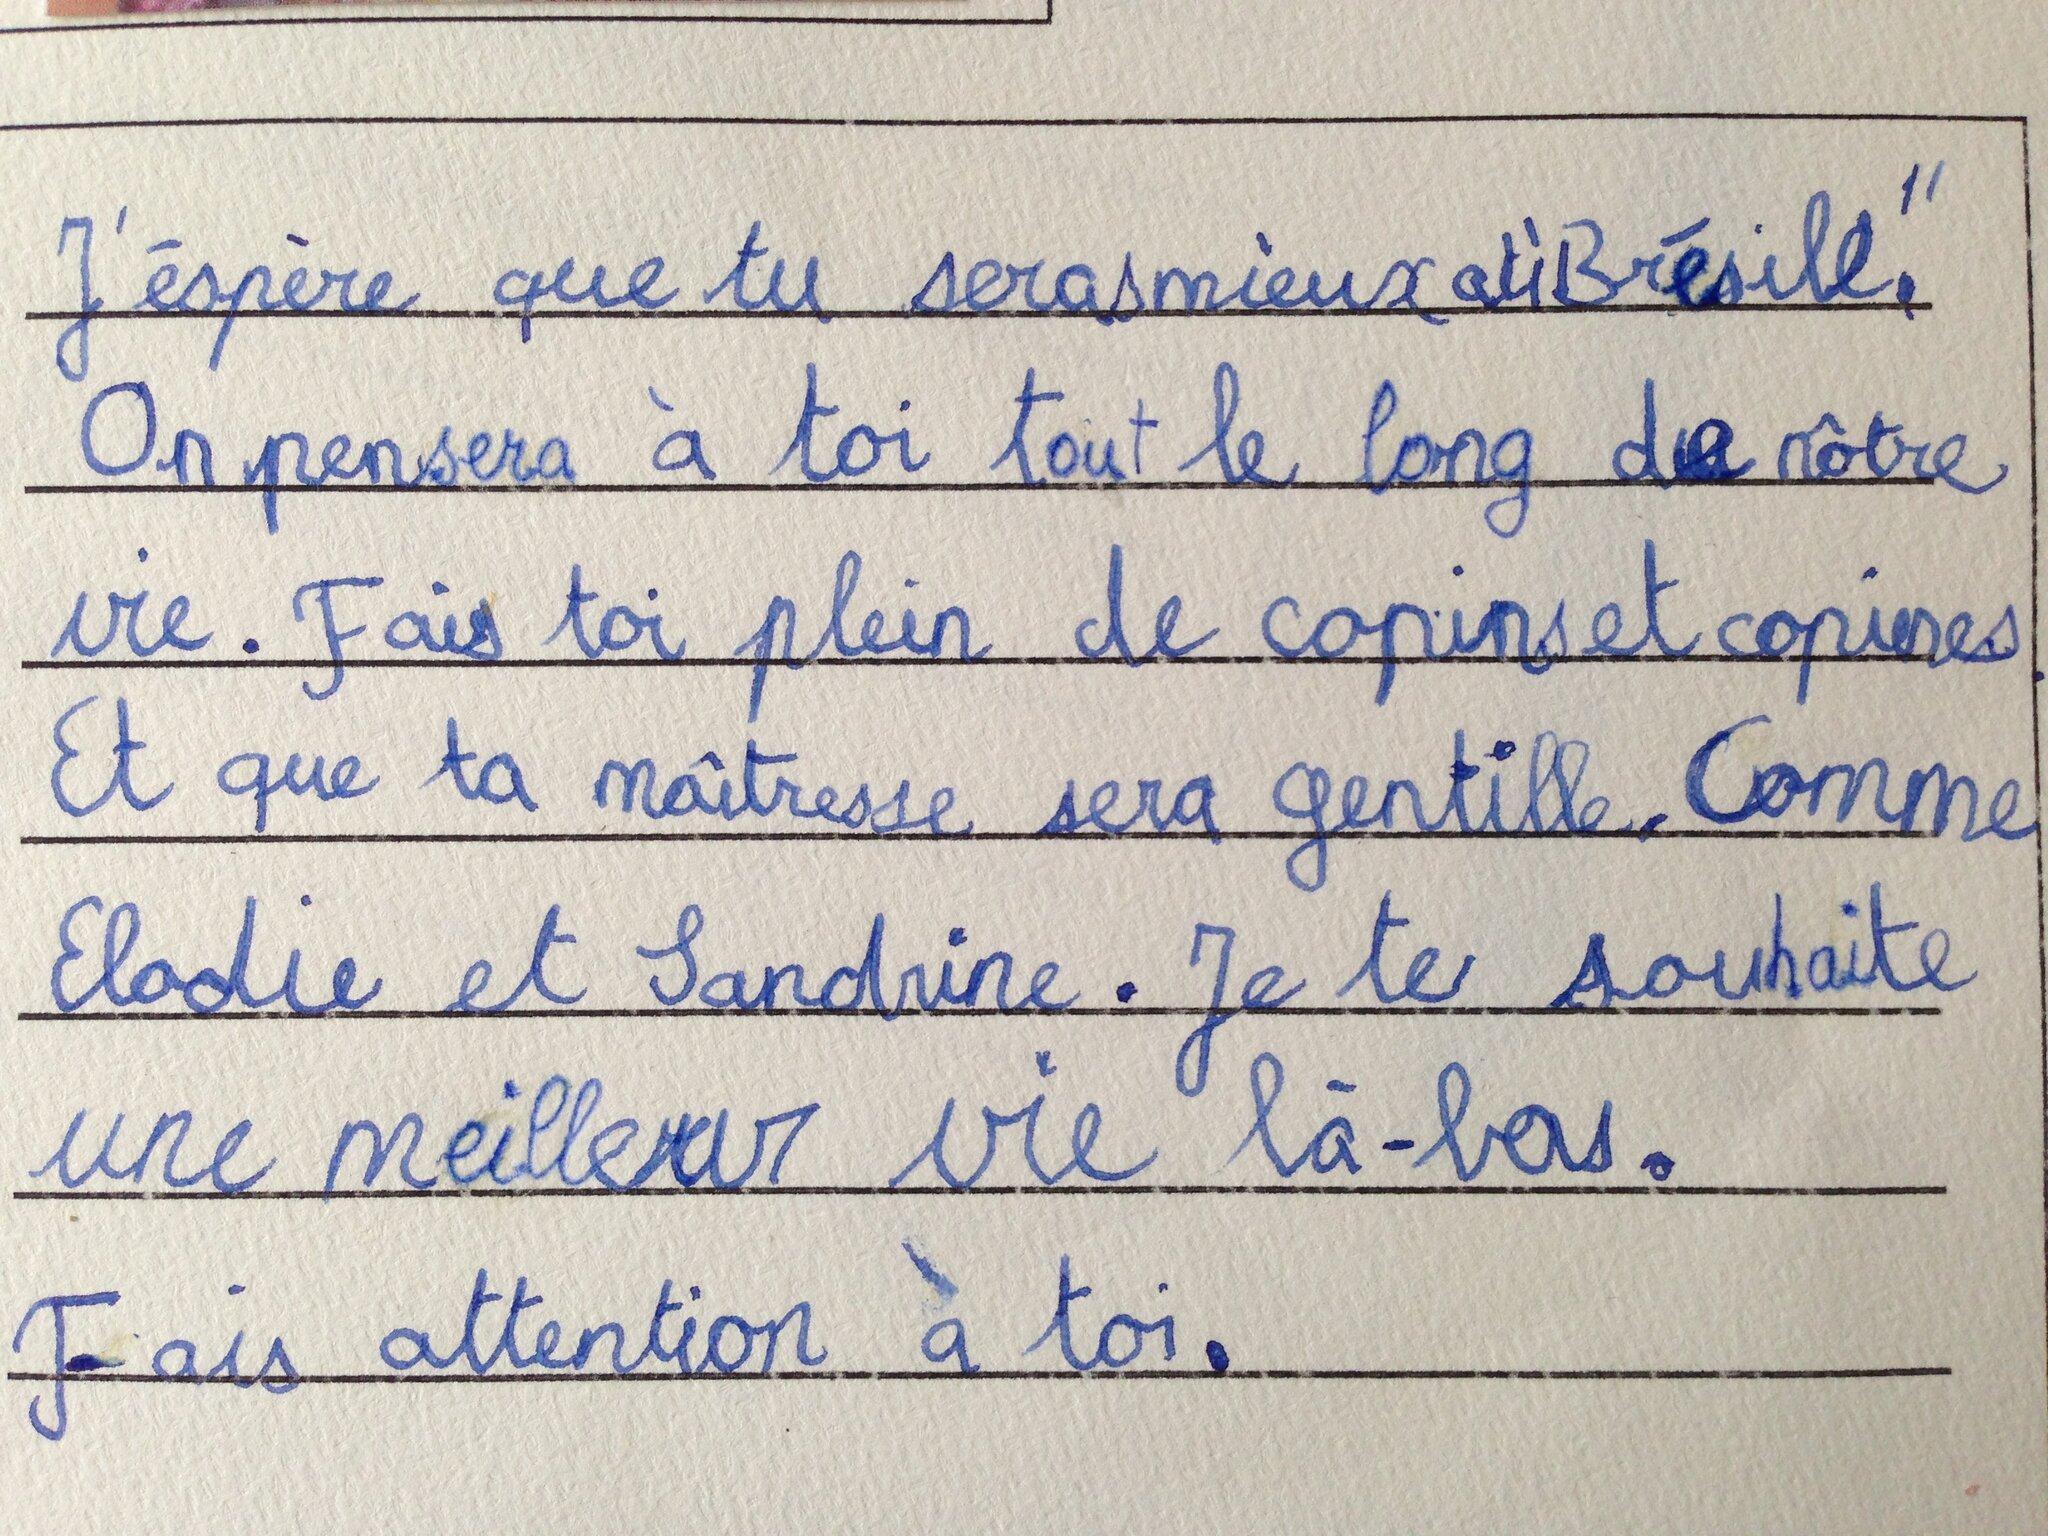 Adeus Gustavo Le Joli Monde De Miss Lilou